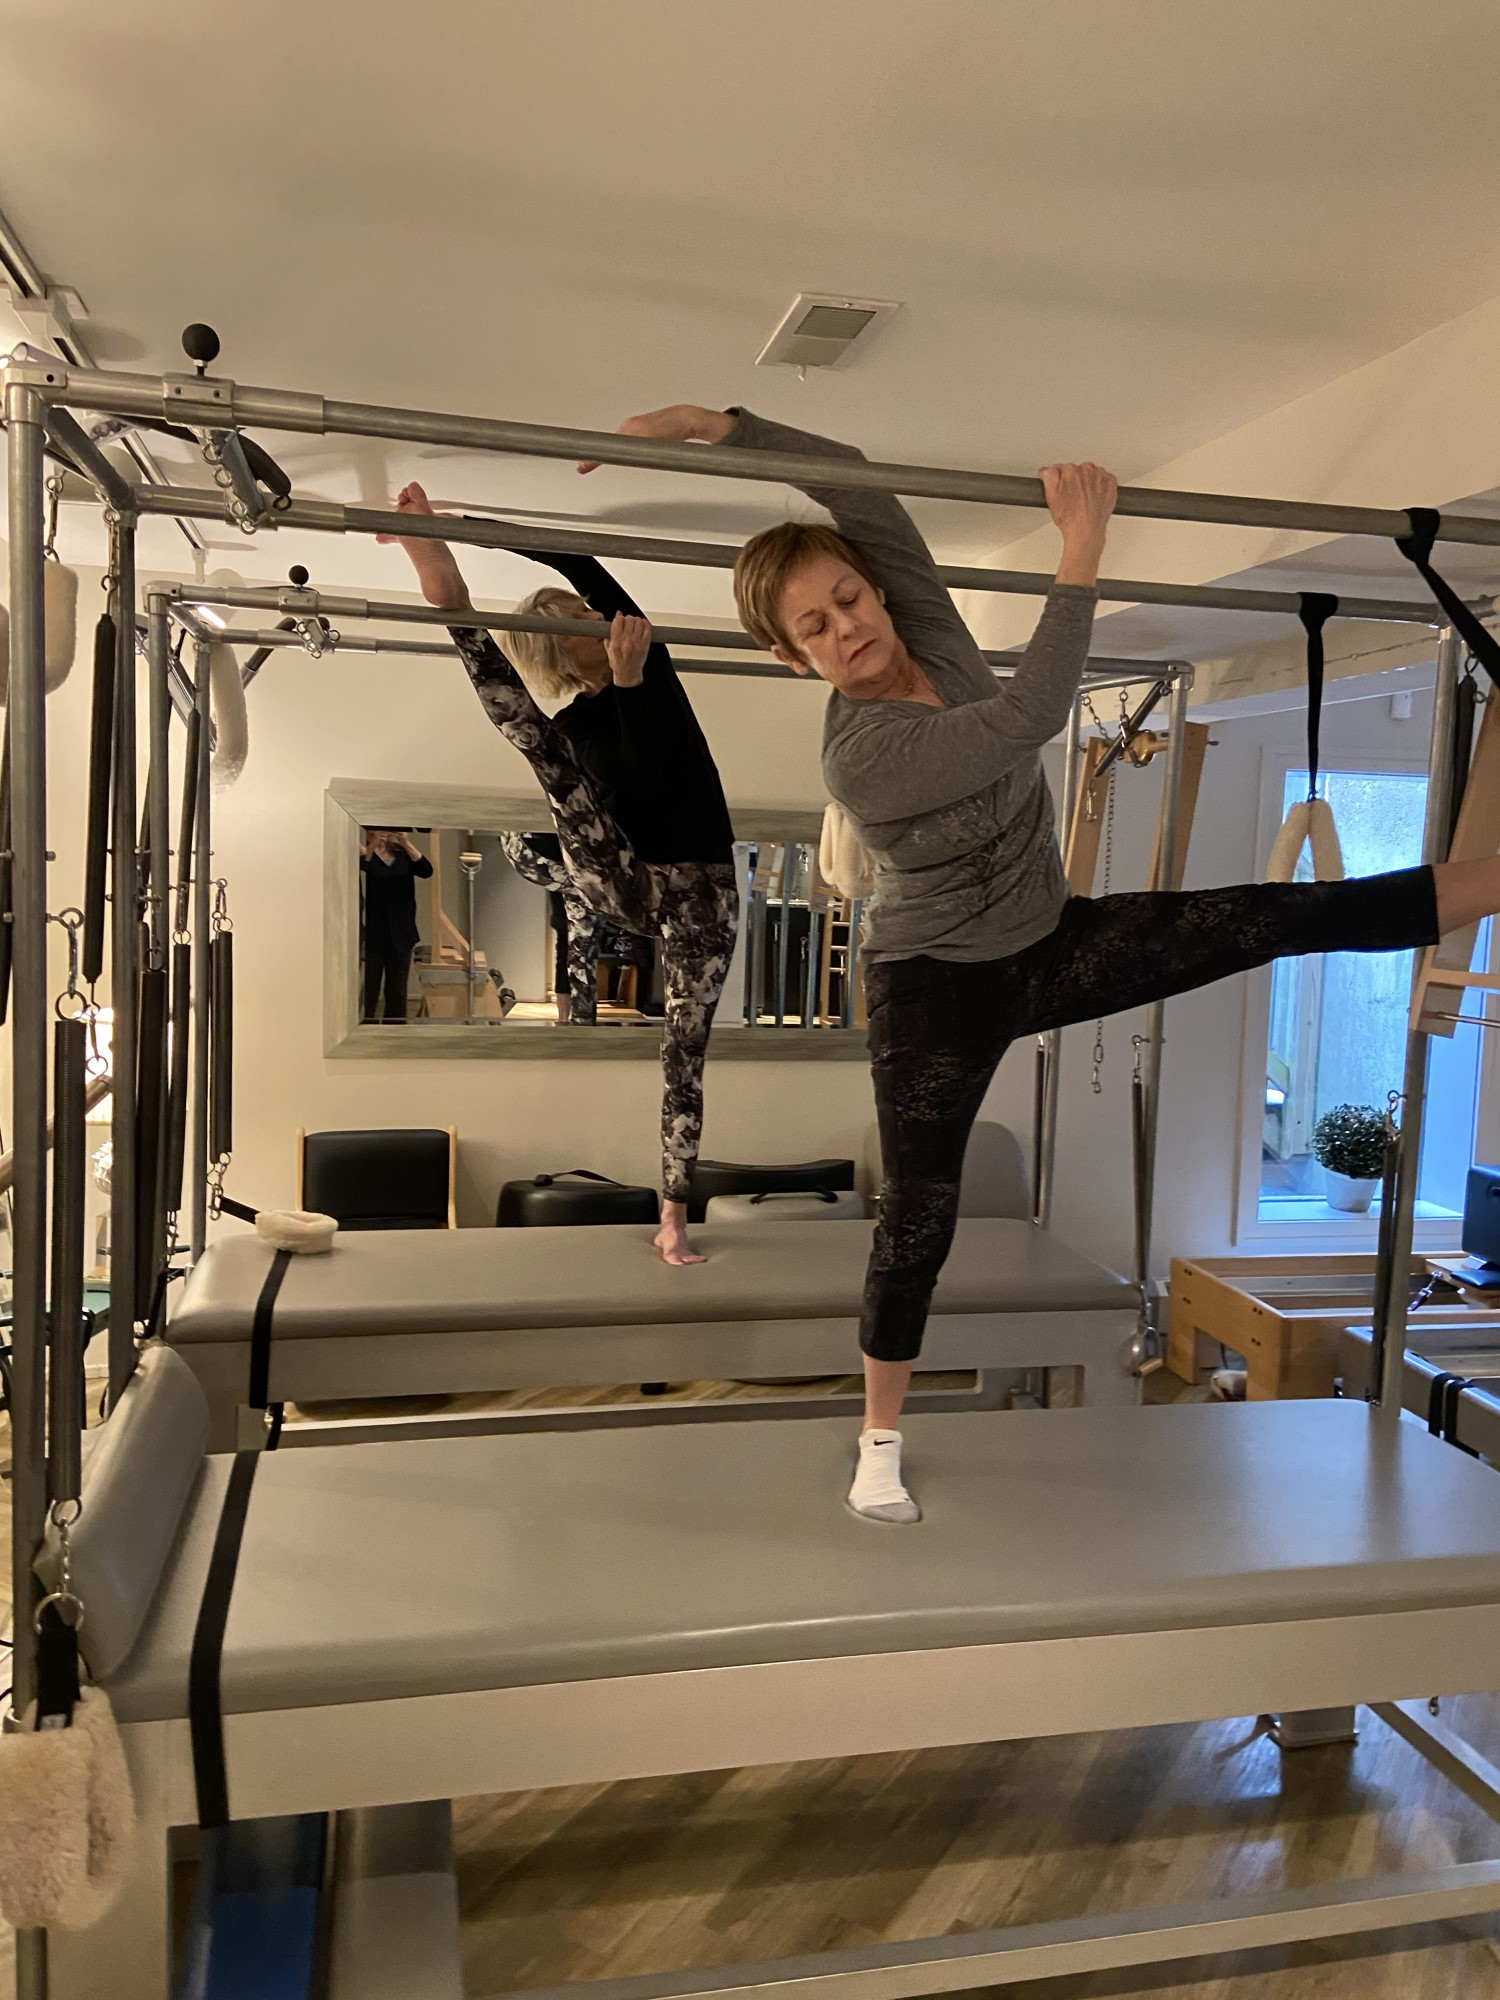 Pilates Room 0272